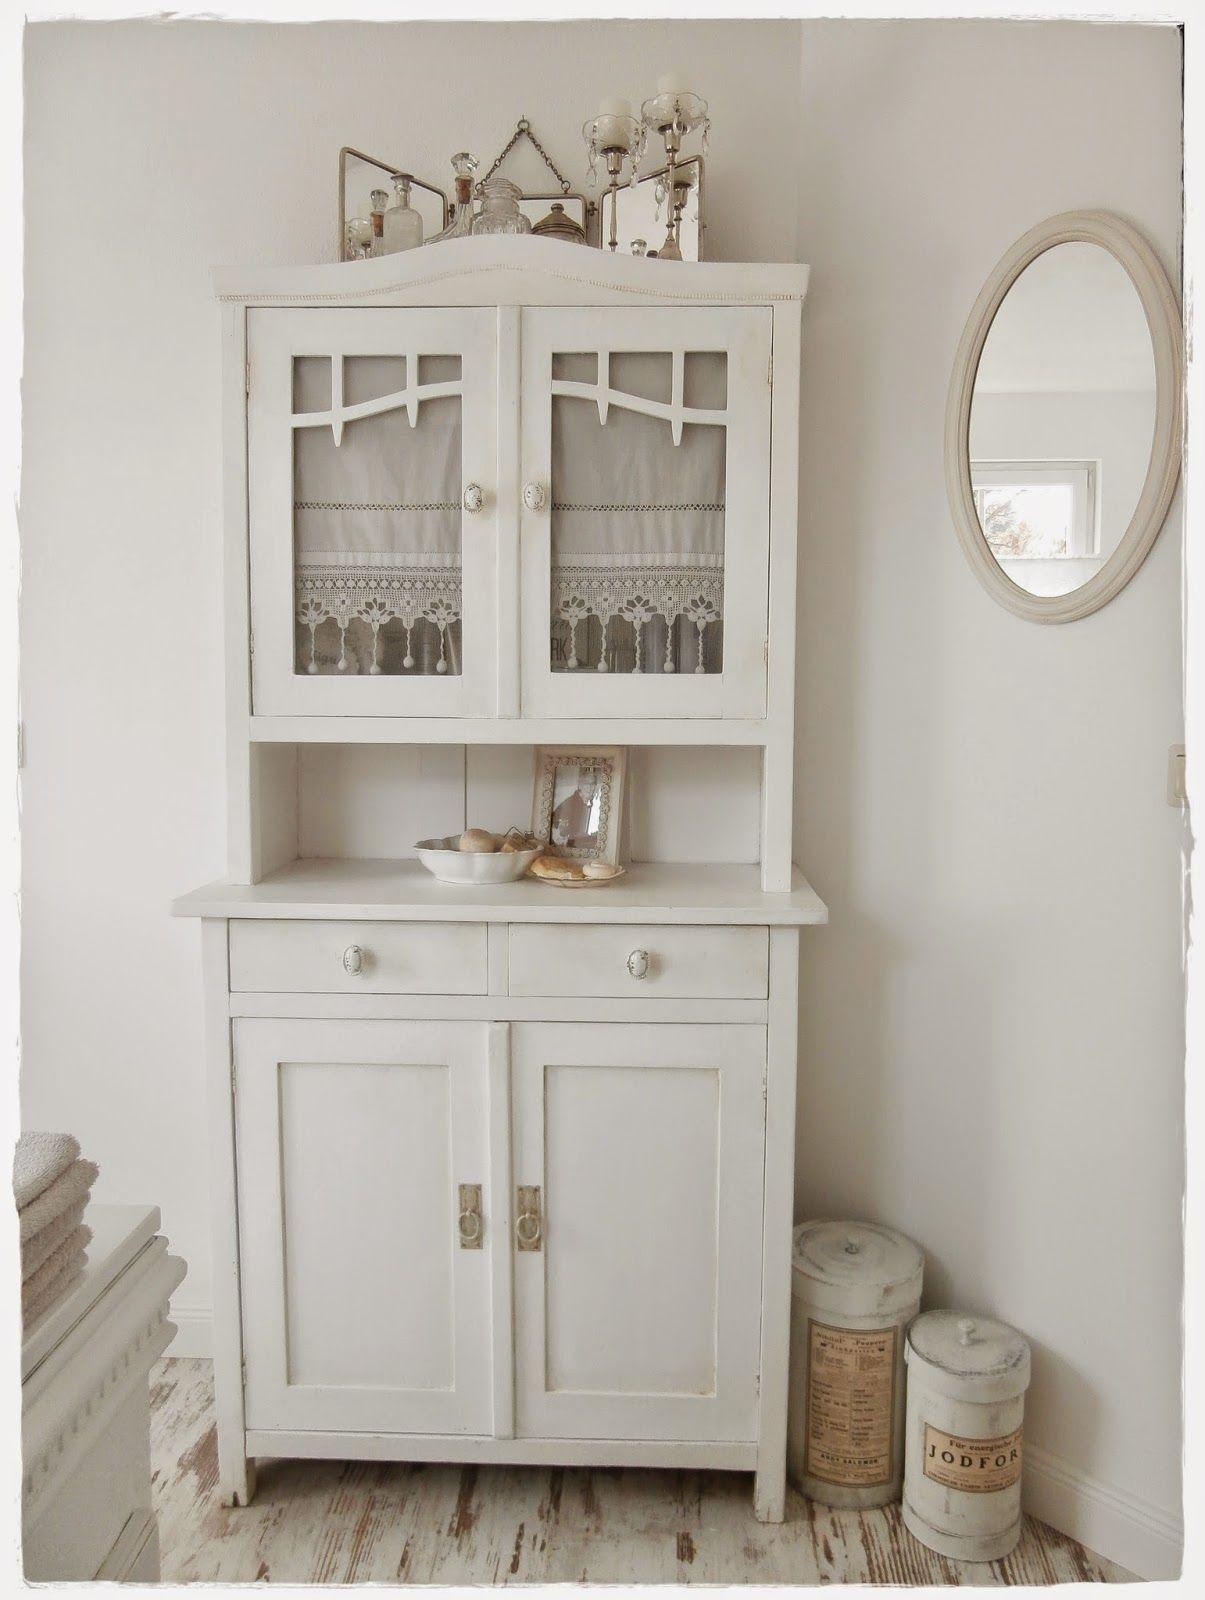 pin von luisa vegan reiki master auf armadi bianchi. Black Bedroom Furniture Sets. Home Design Ideas